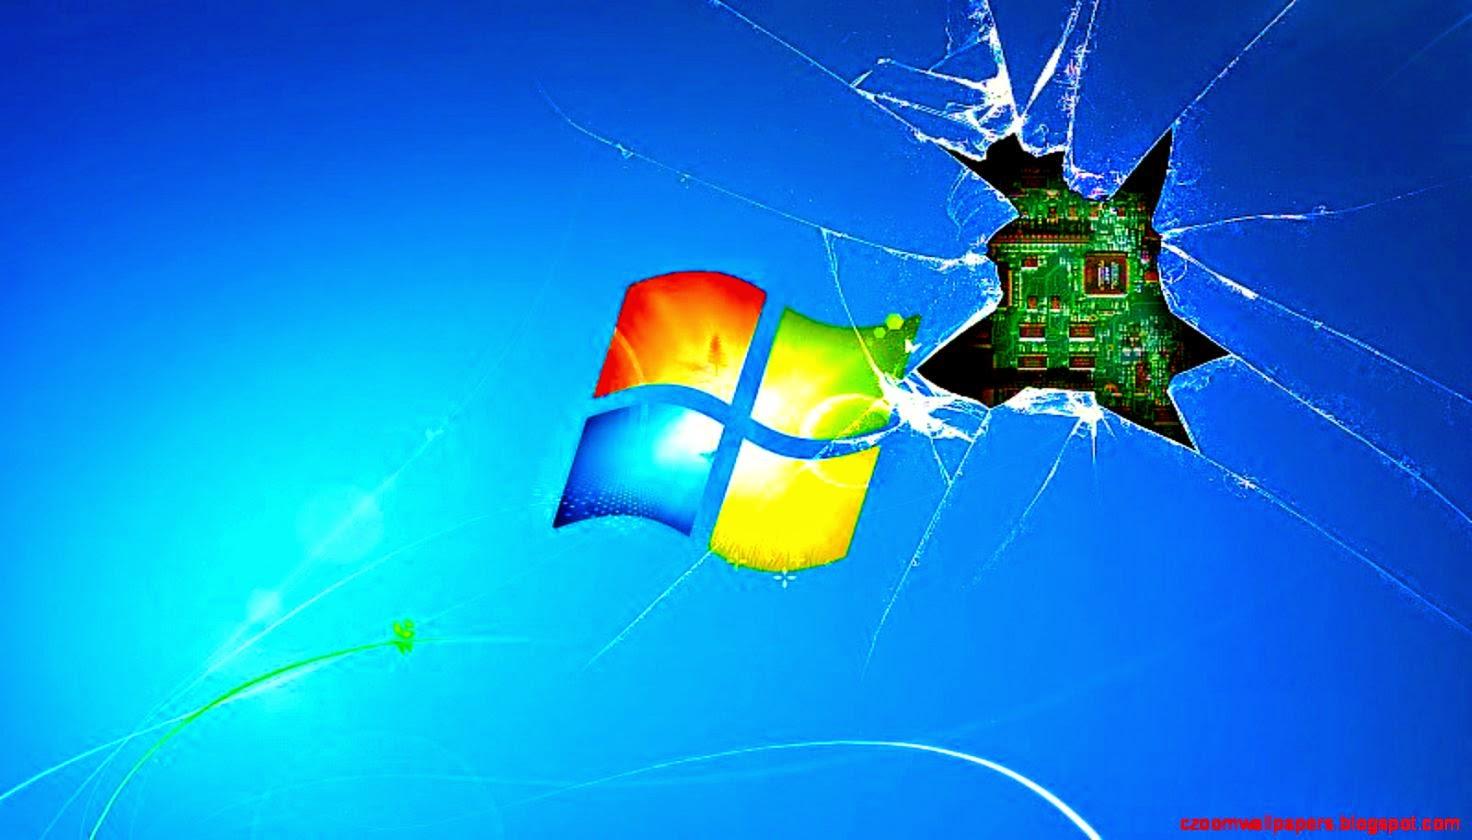 window 7 wallpaper broken hd -#main